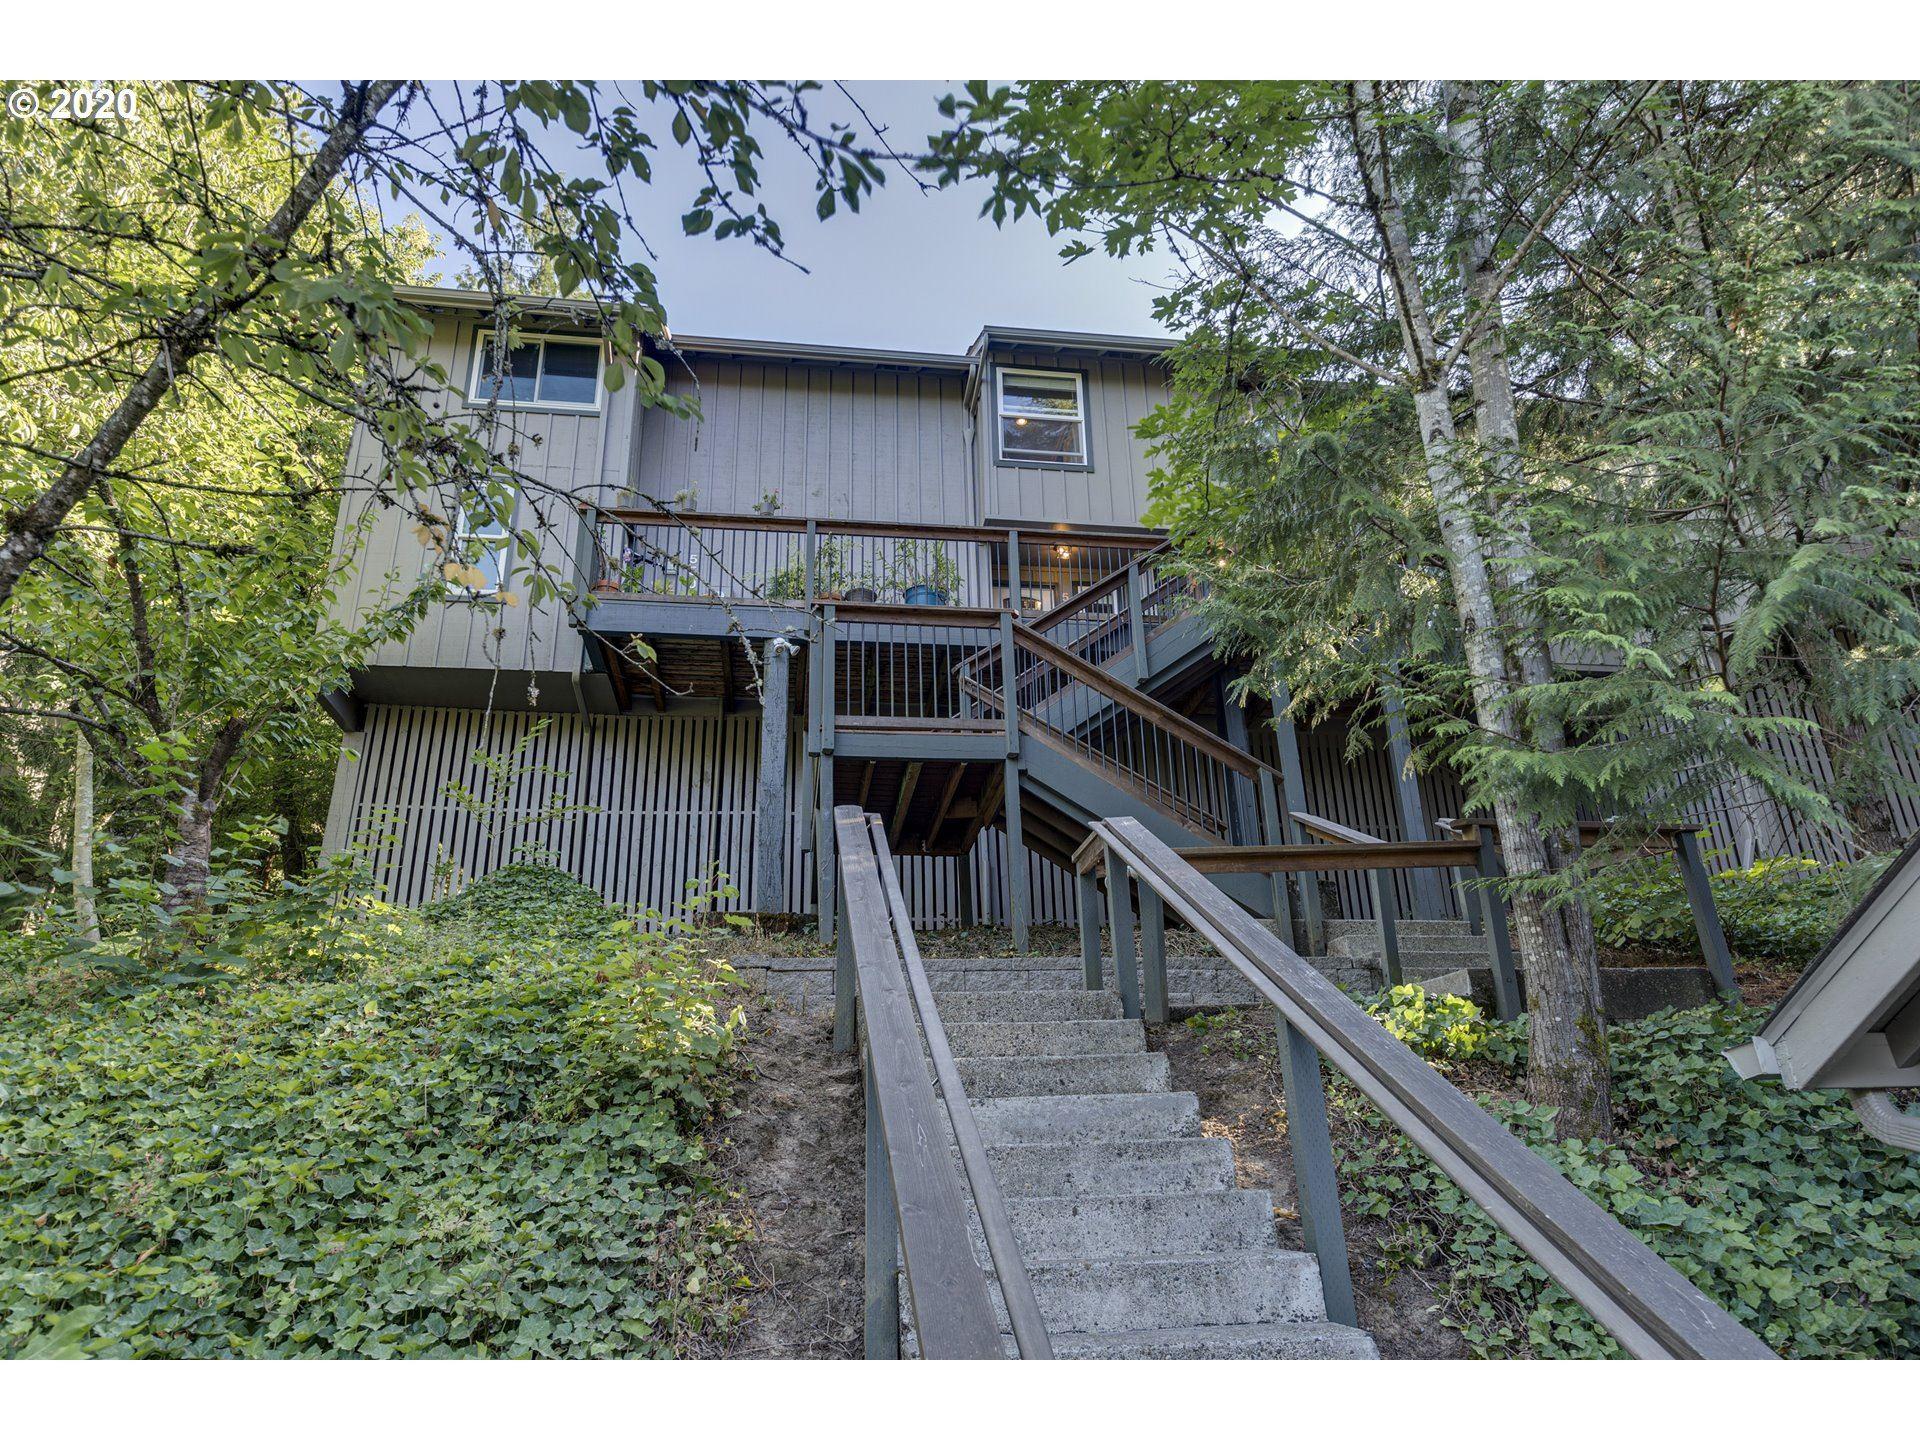 5503 SW MULTNOMAH BLVD, Portland, OR 97219 - MLS#: 20042460